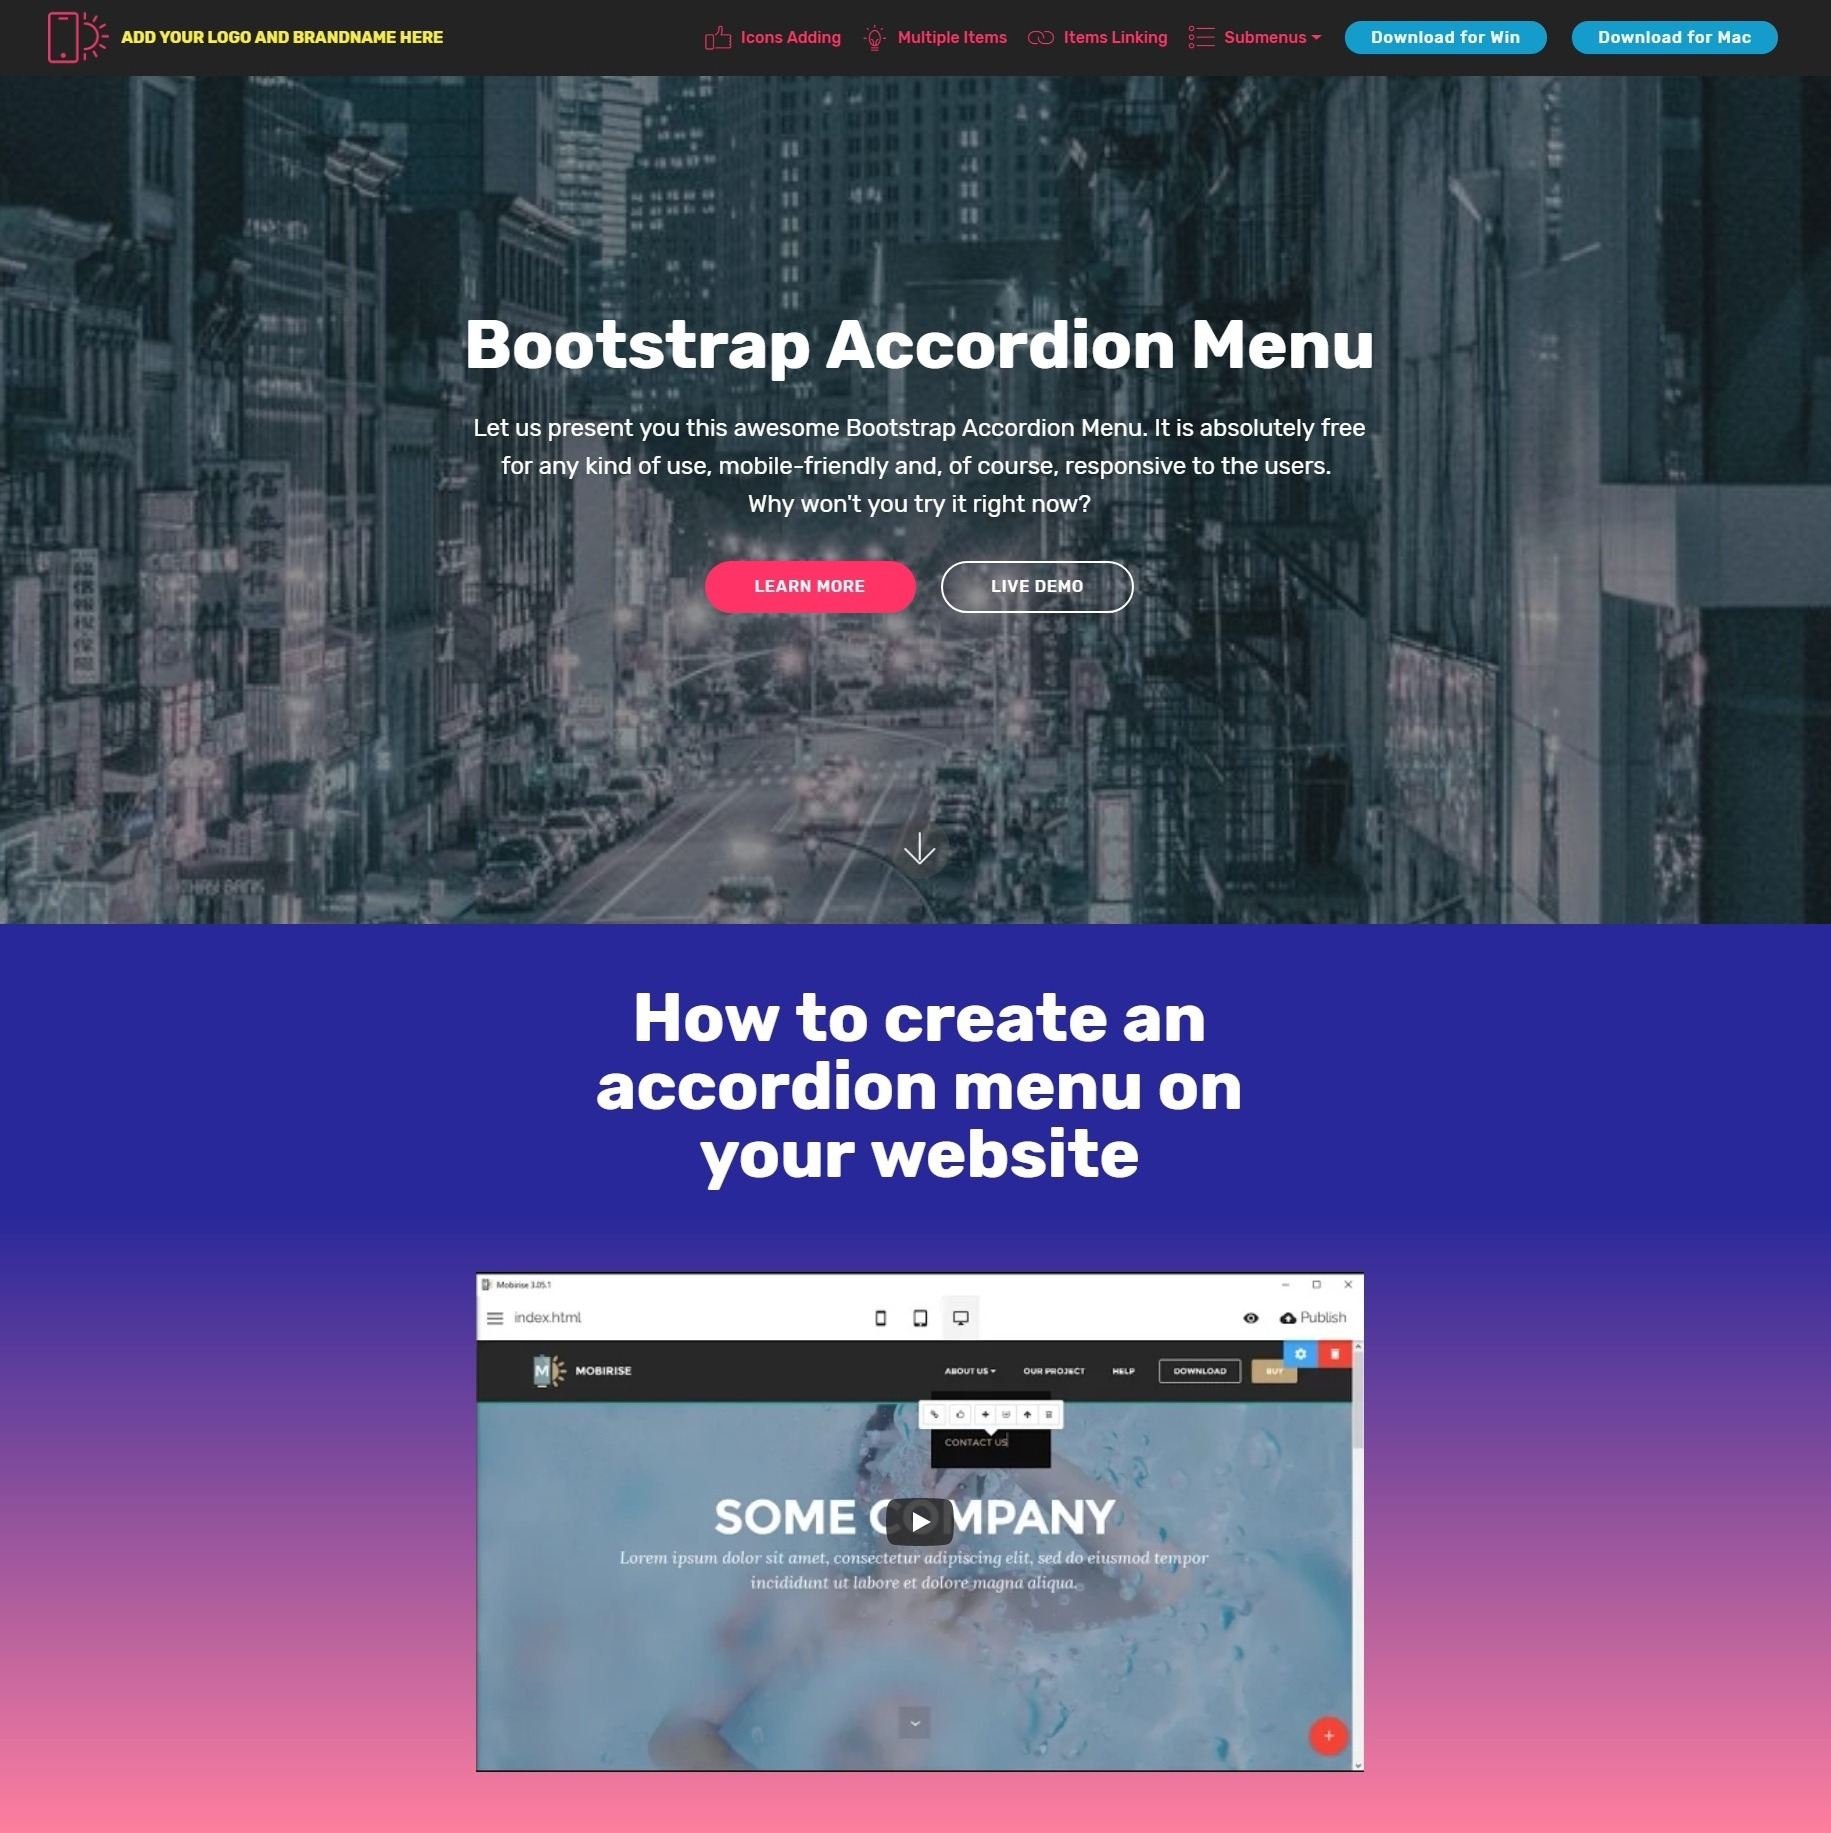 Bootstrap Accordion Menu